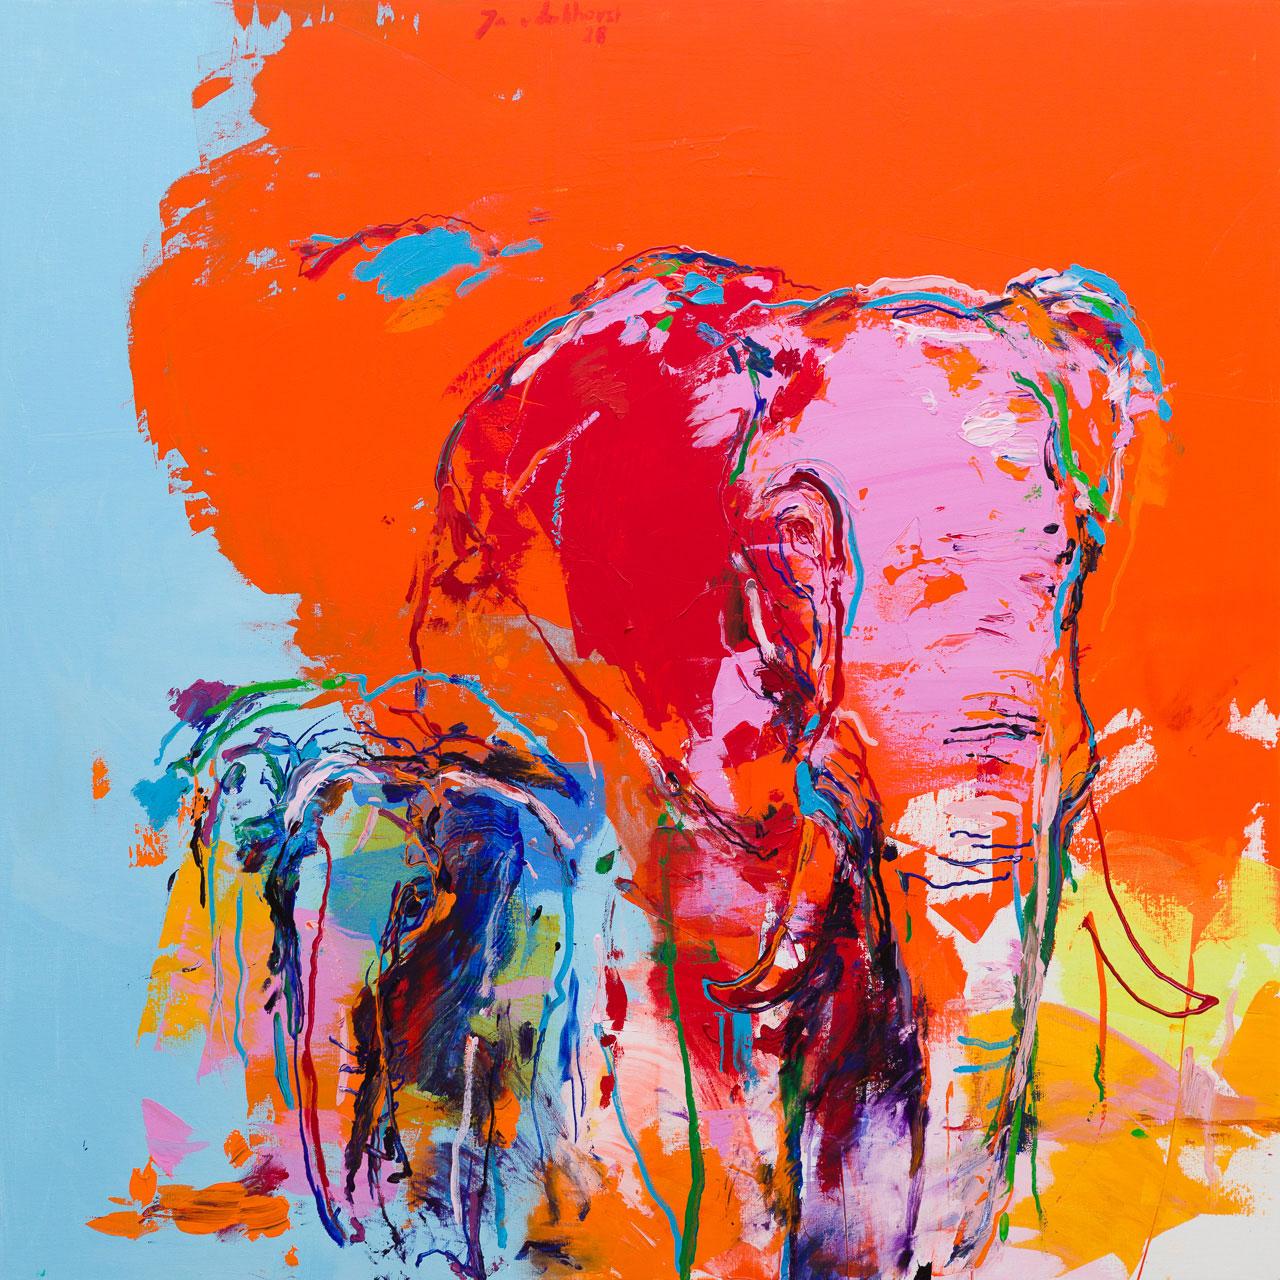 Gekleurde olifant schilderij